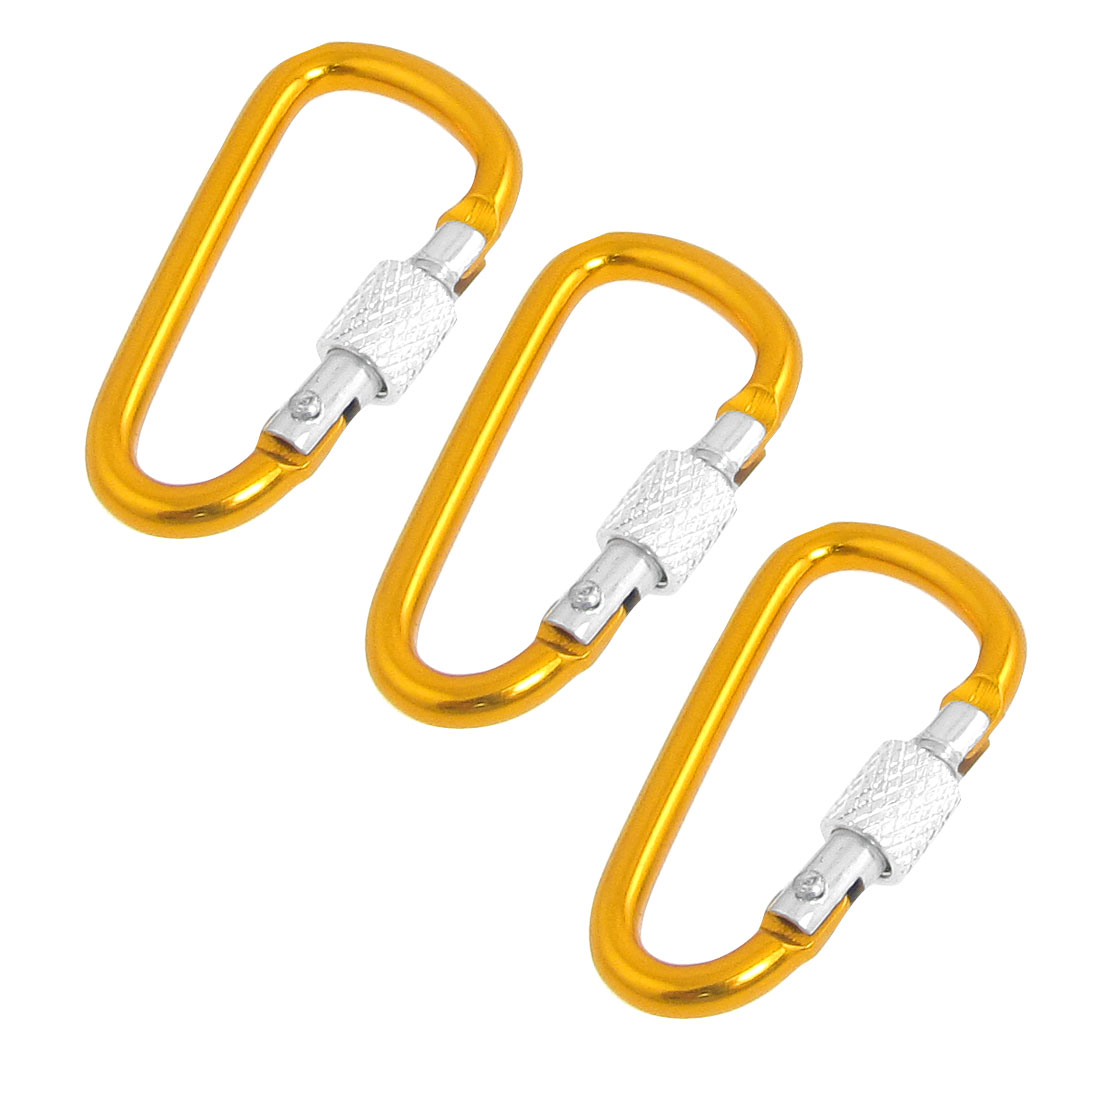 3 Pcs Yellow Aluminum Spring Loaded Gate Lockable Carabiner